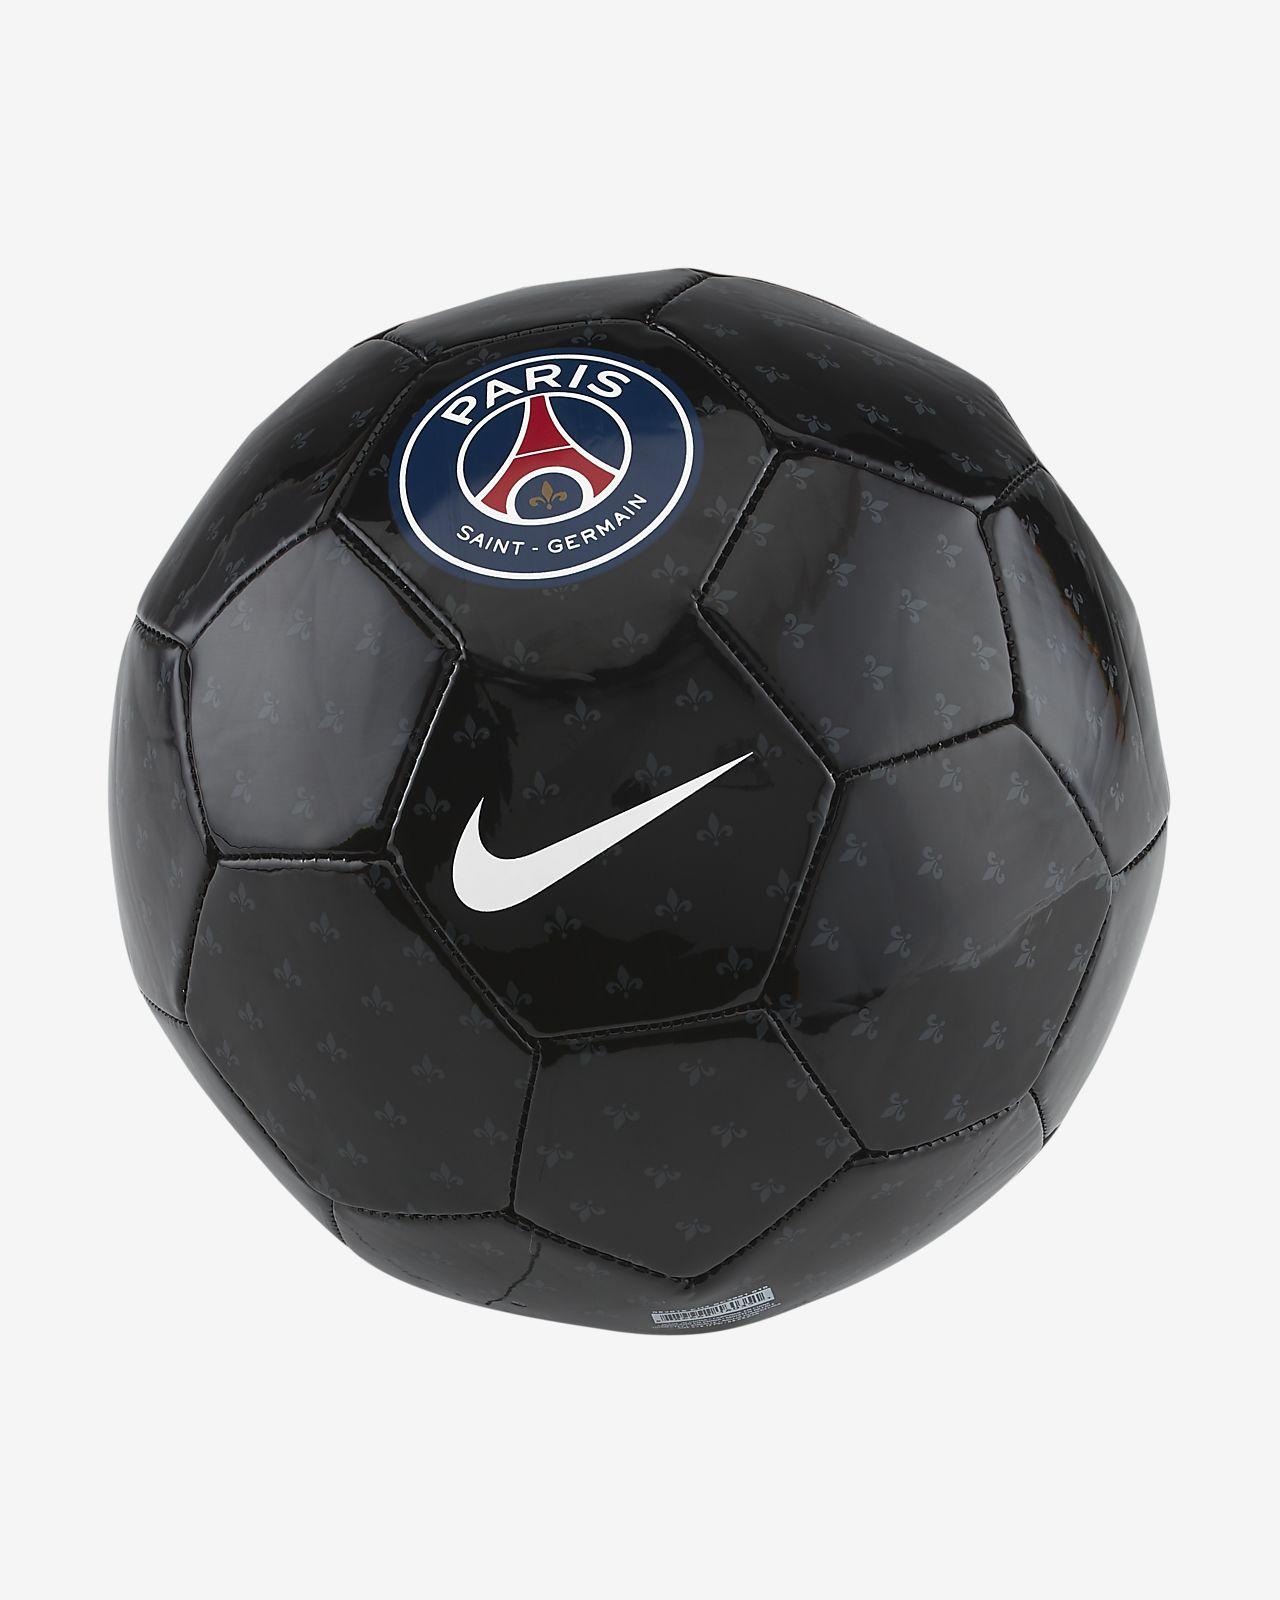 Paris Saint-Germain Supporters Football